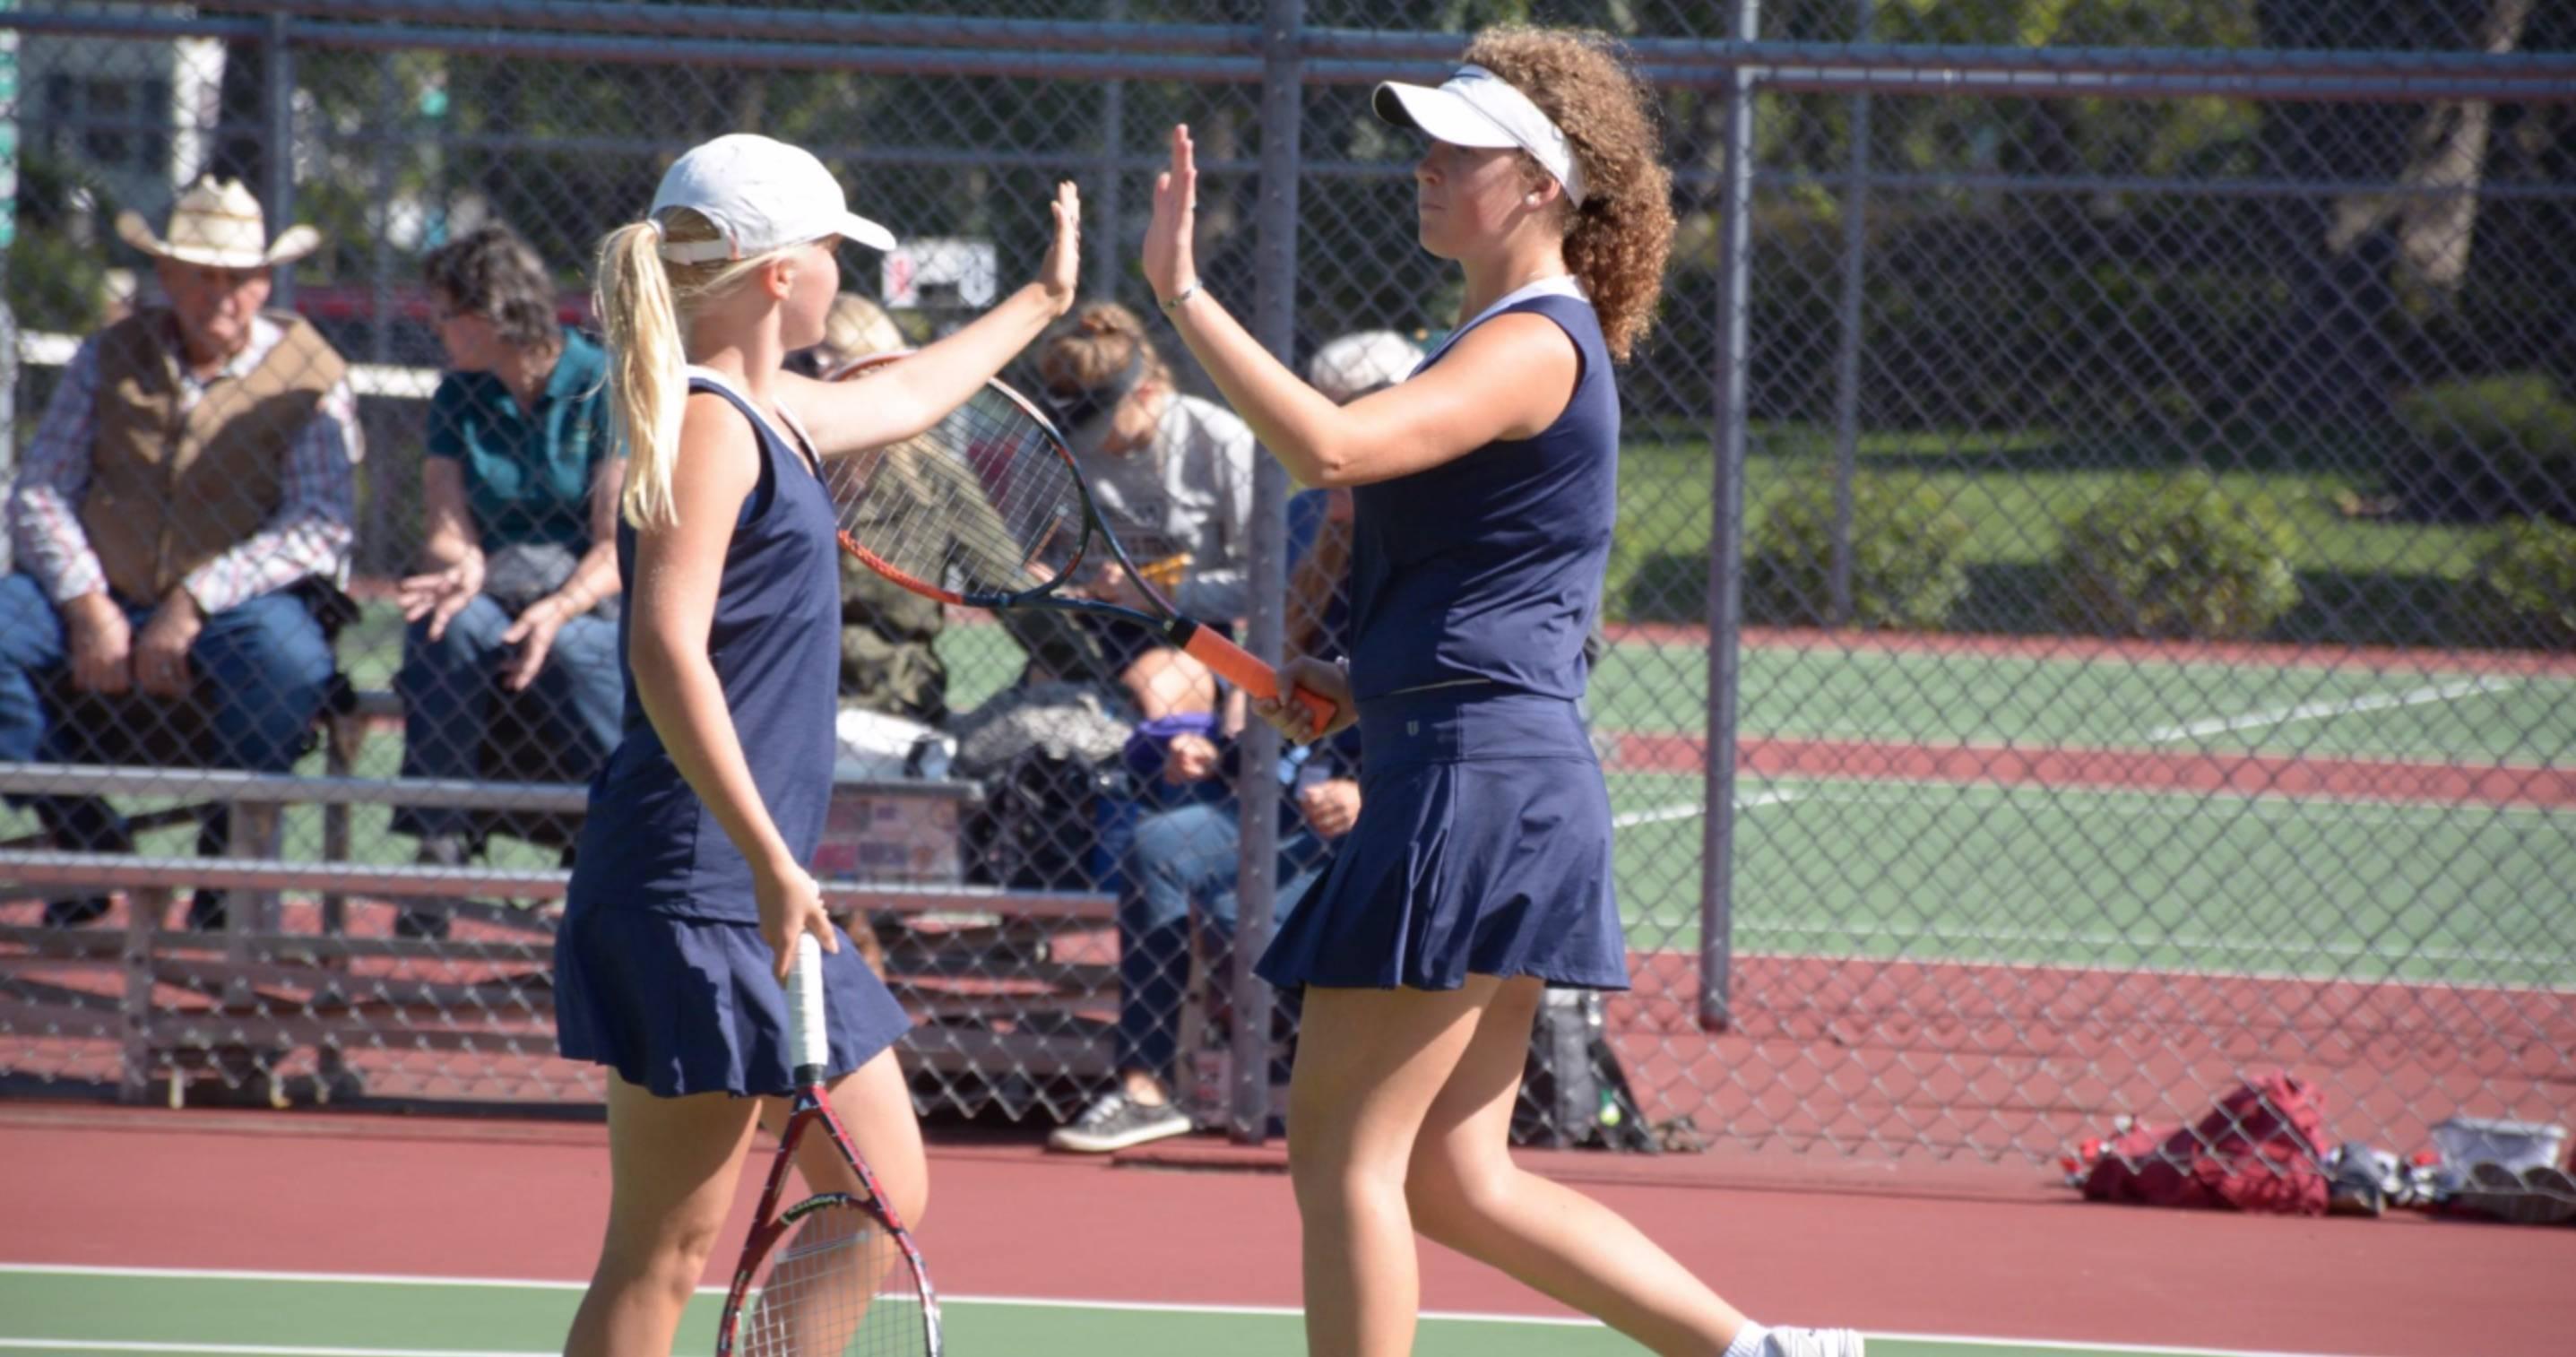 Girl tennis players